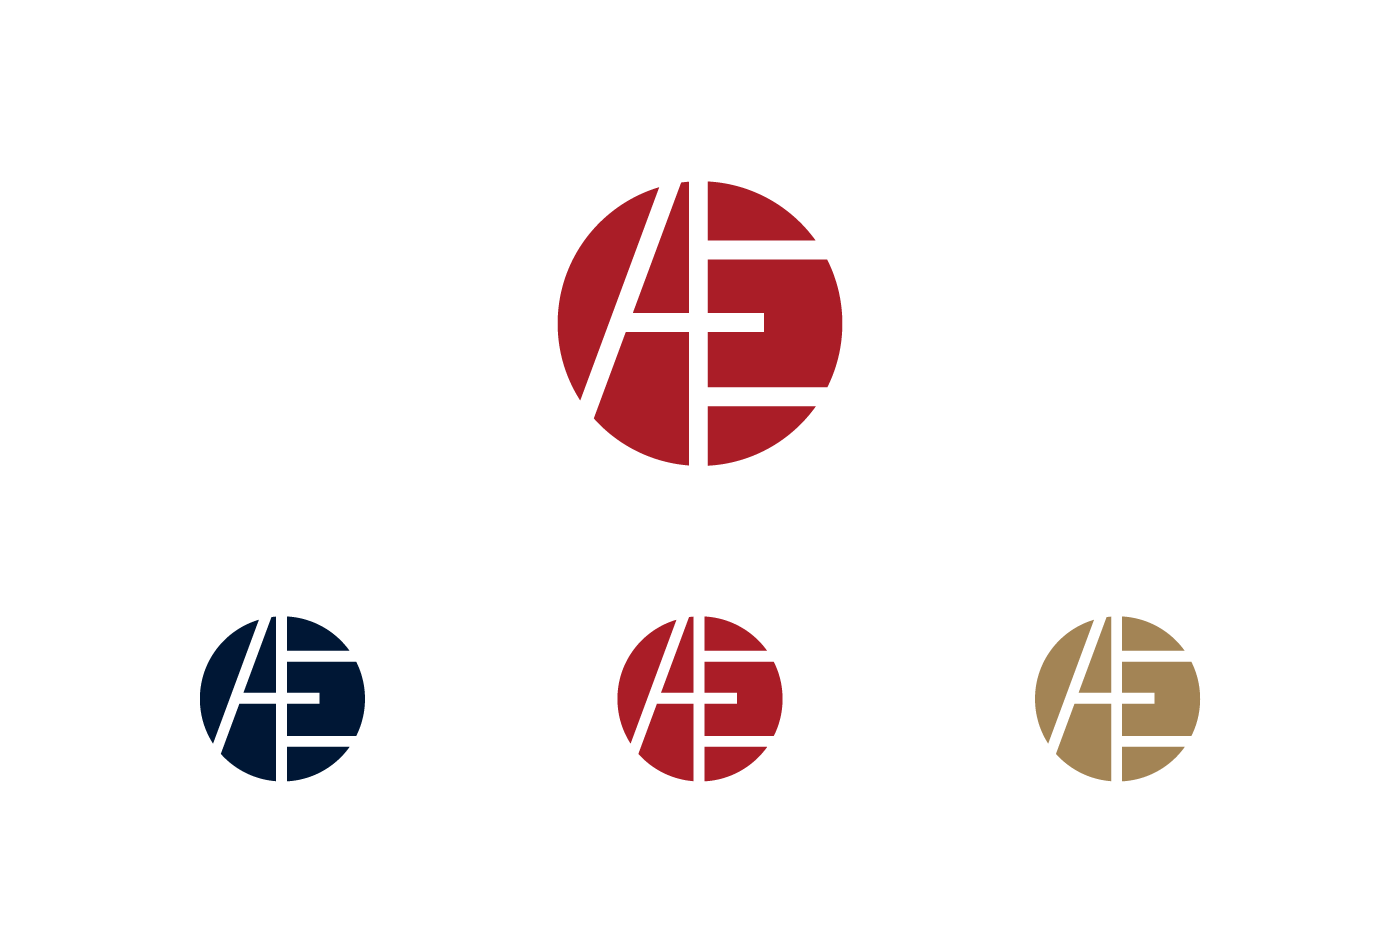 AE logomark